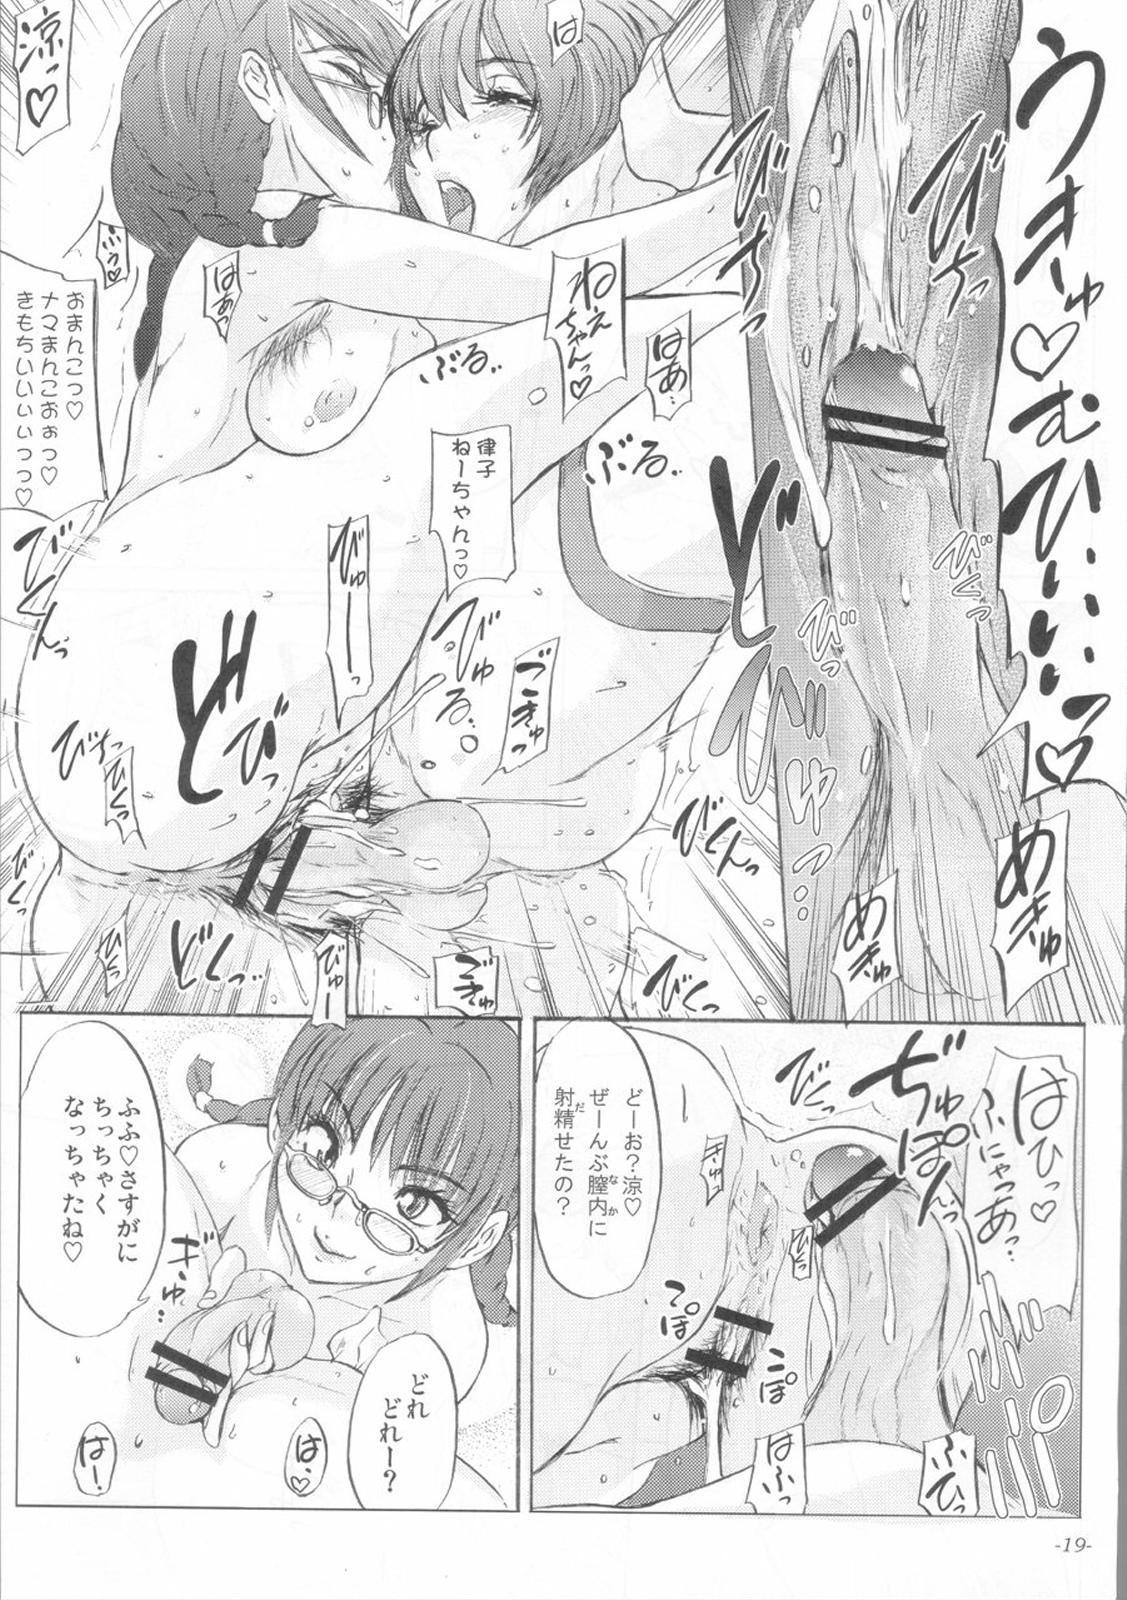 Kaikin!! Oh! tin tin Idol - Ryo's squirt show 19